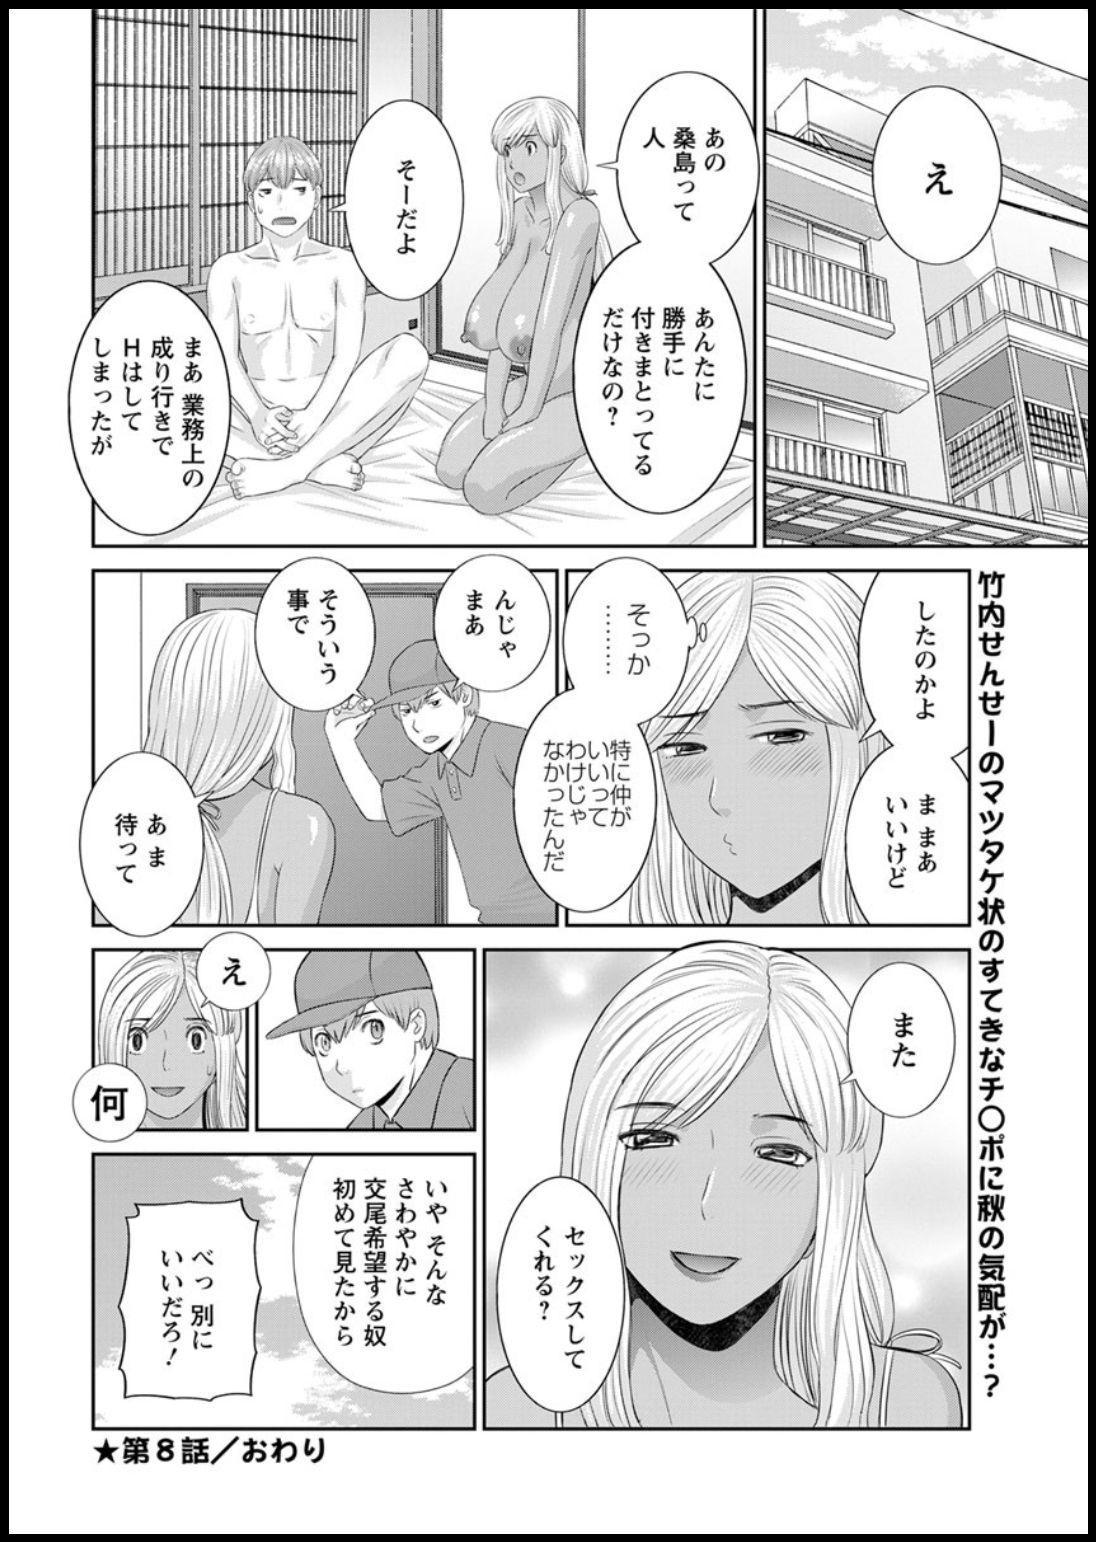 [Kawamori Misaki] Kaikan Hitotsuma Gakuen Ch. 1-6, 8-20 [Digital] 129